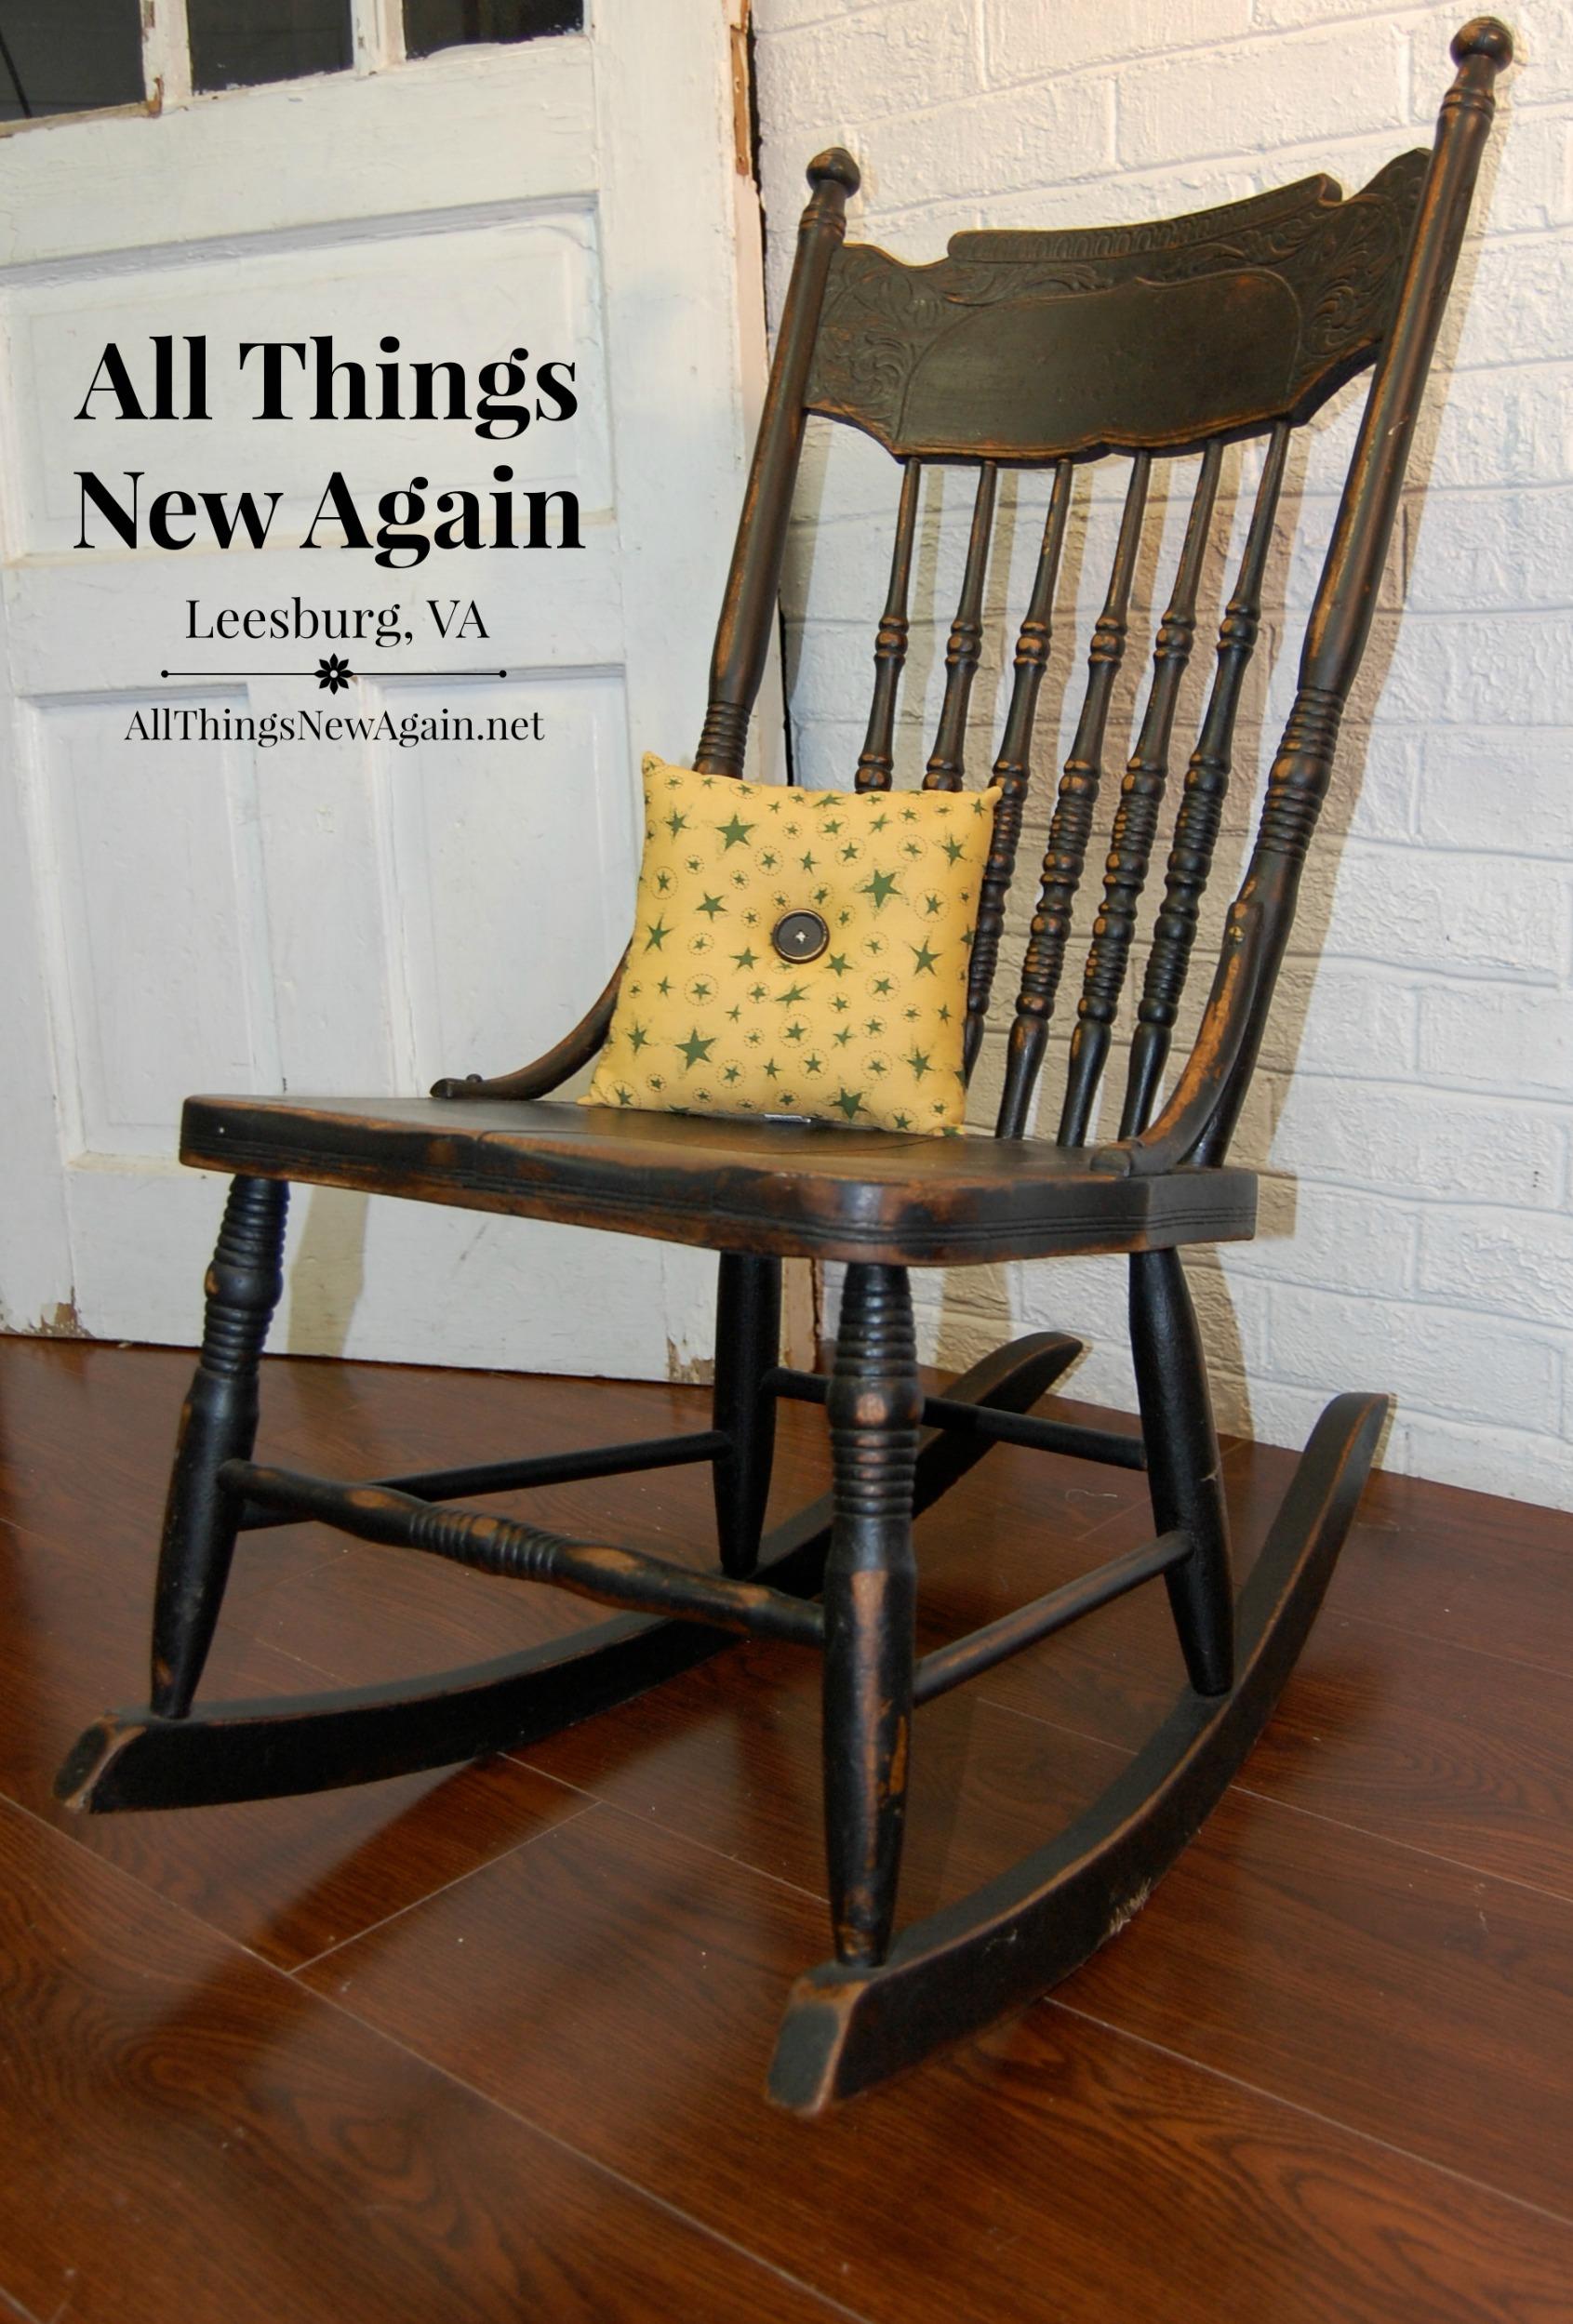 a chair affair cheap black covers for sale at all things new again